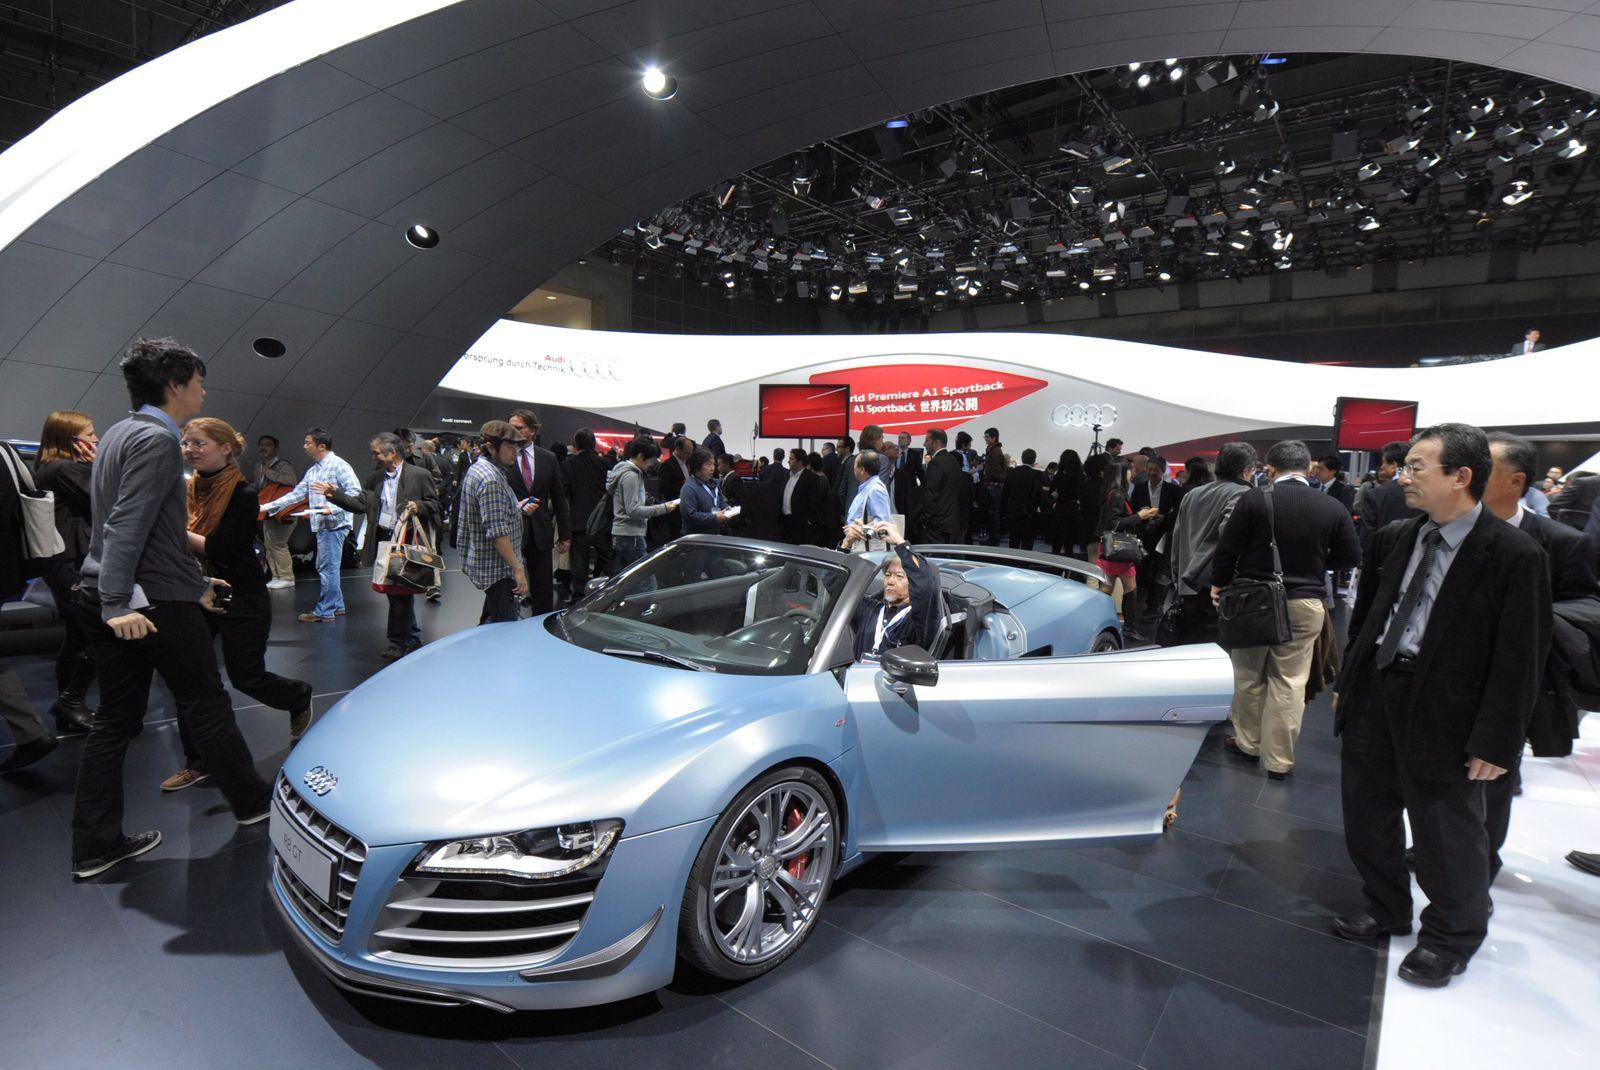 Tokio Motor Show / Audi R8 GT